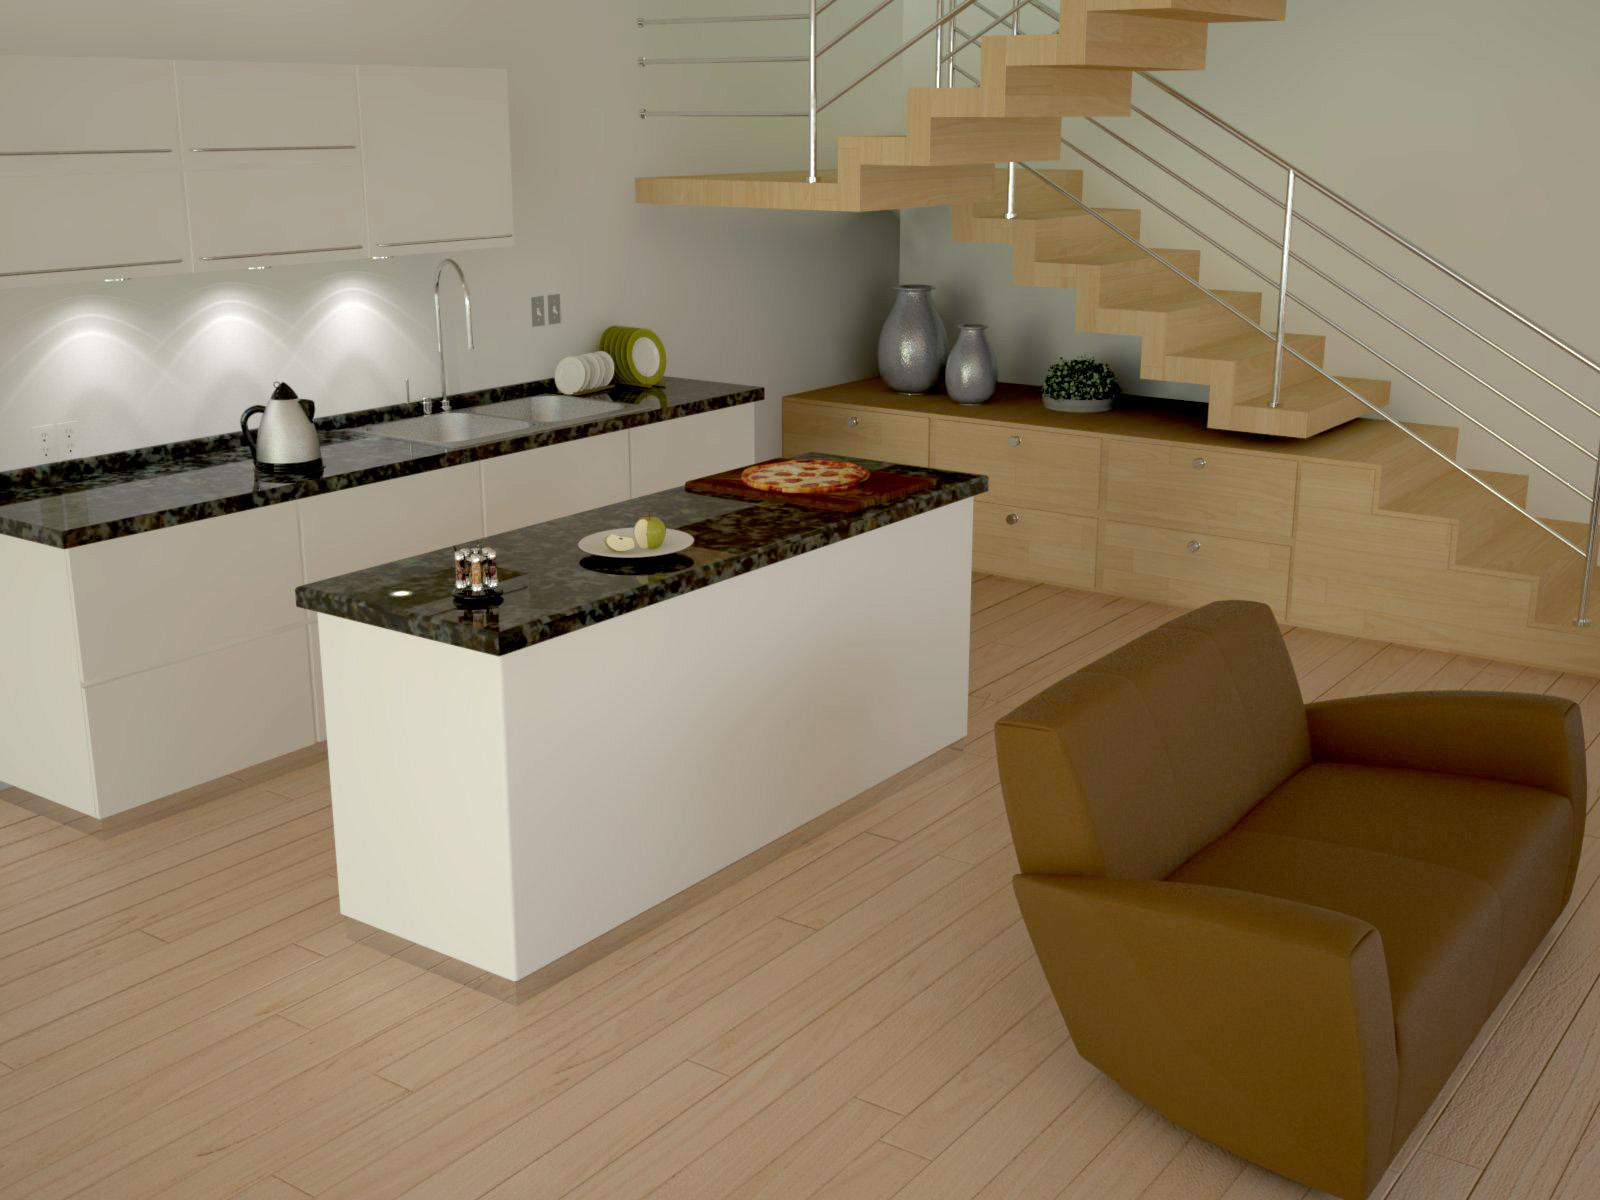 Living Room and Mini bar 3 by nektares on DeviantArt